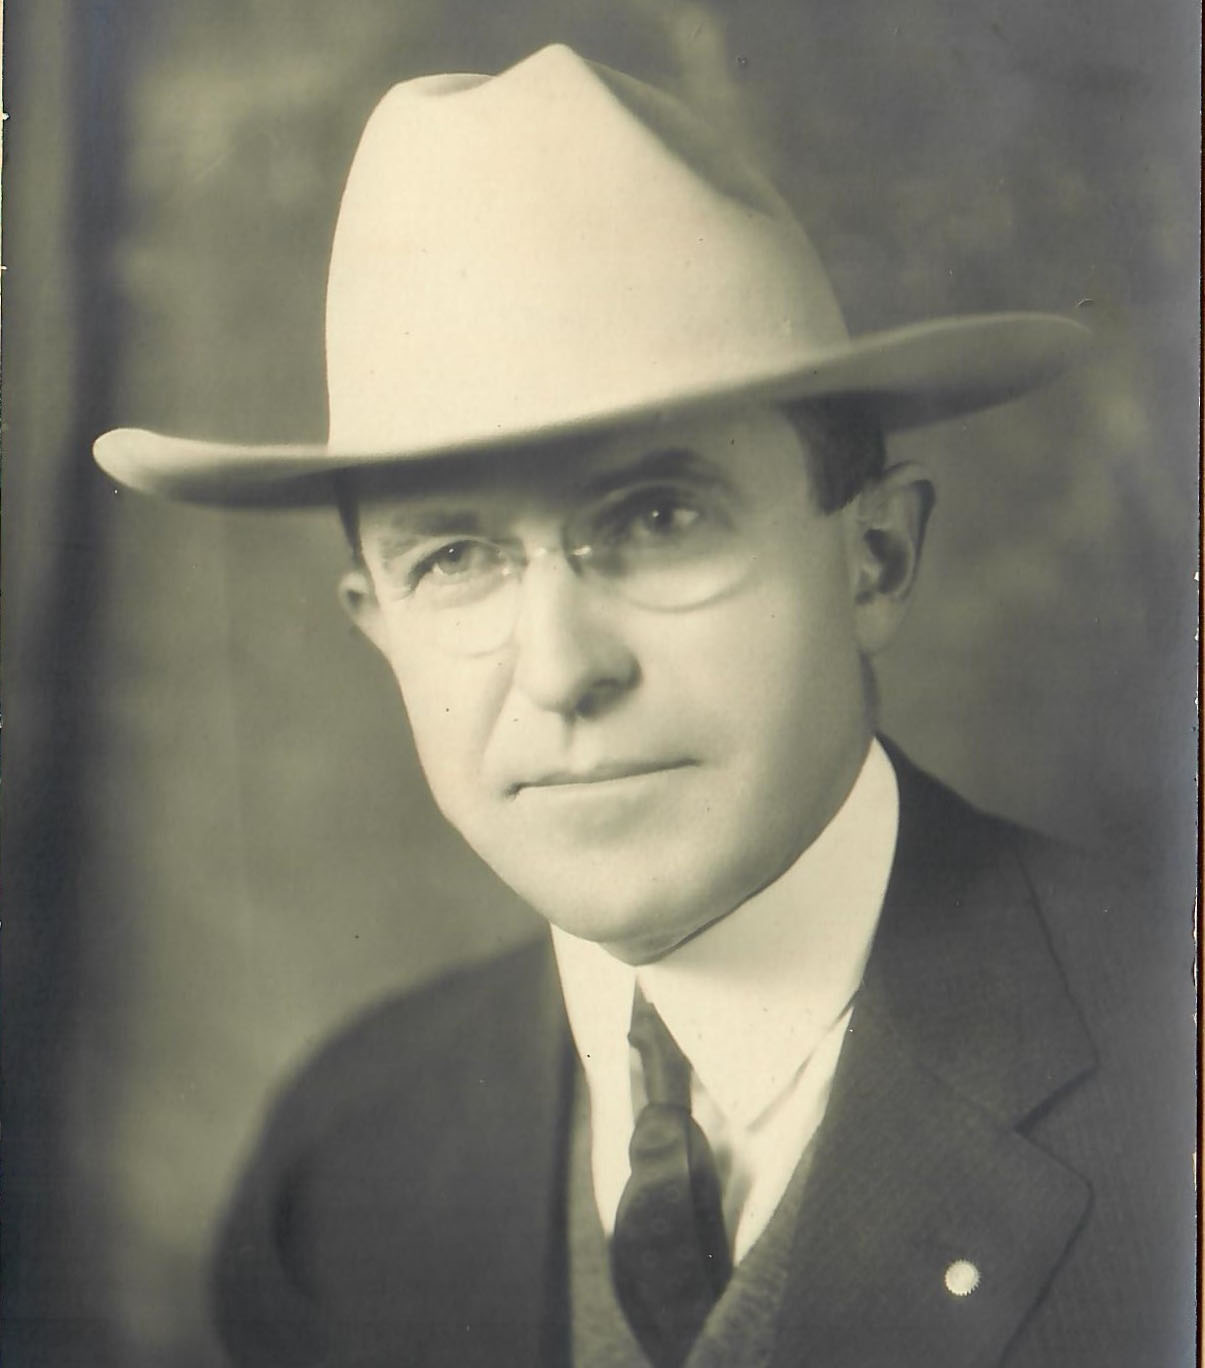 w.e. barnum portrait unsized